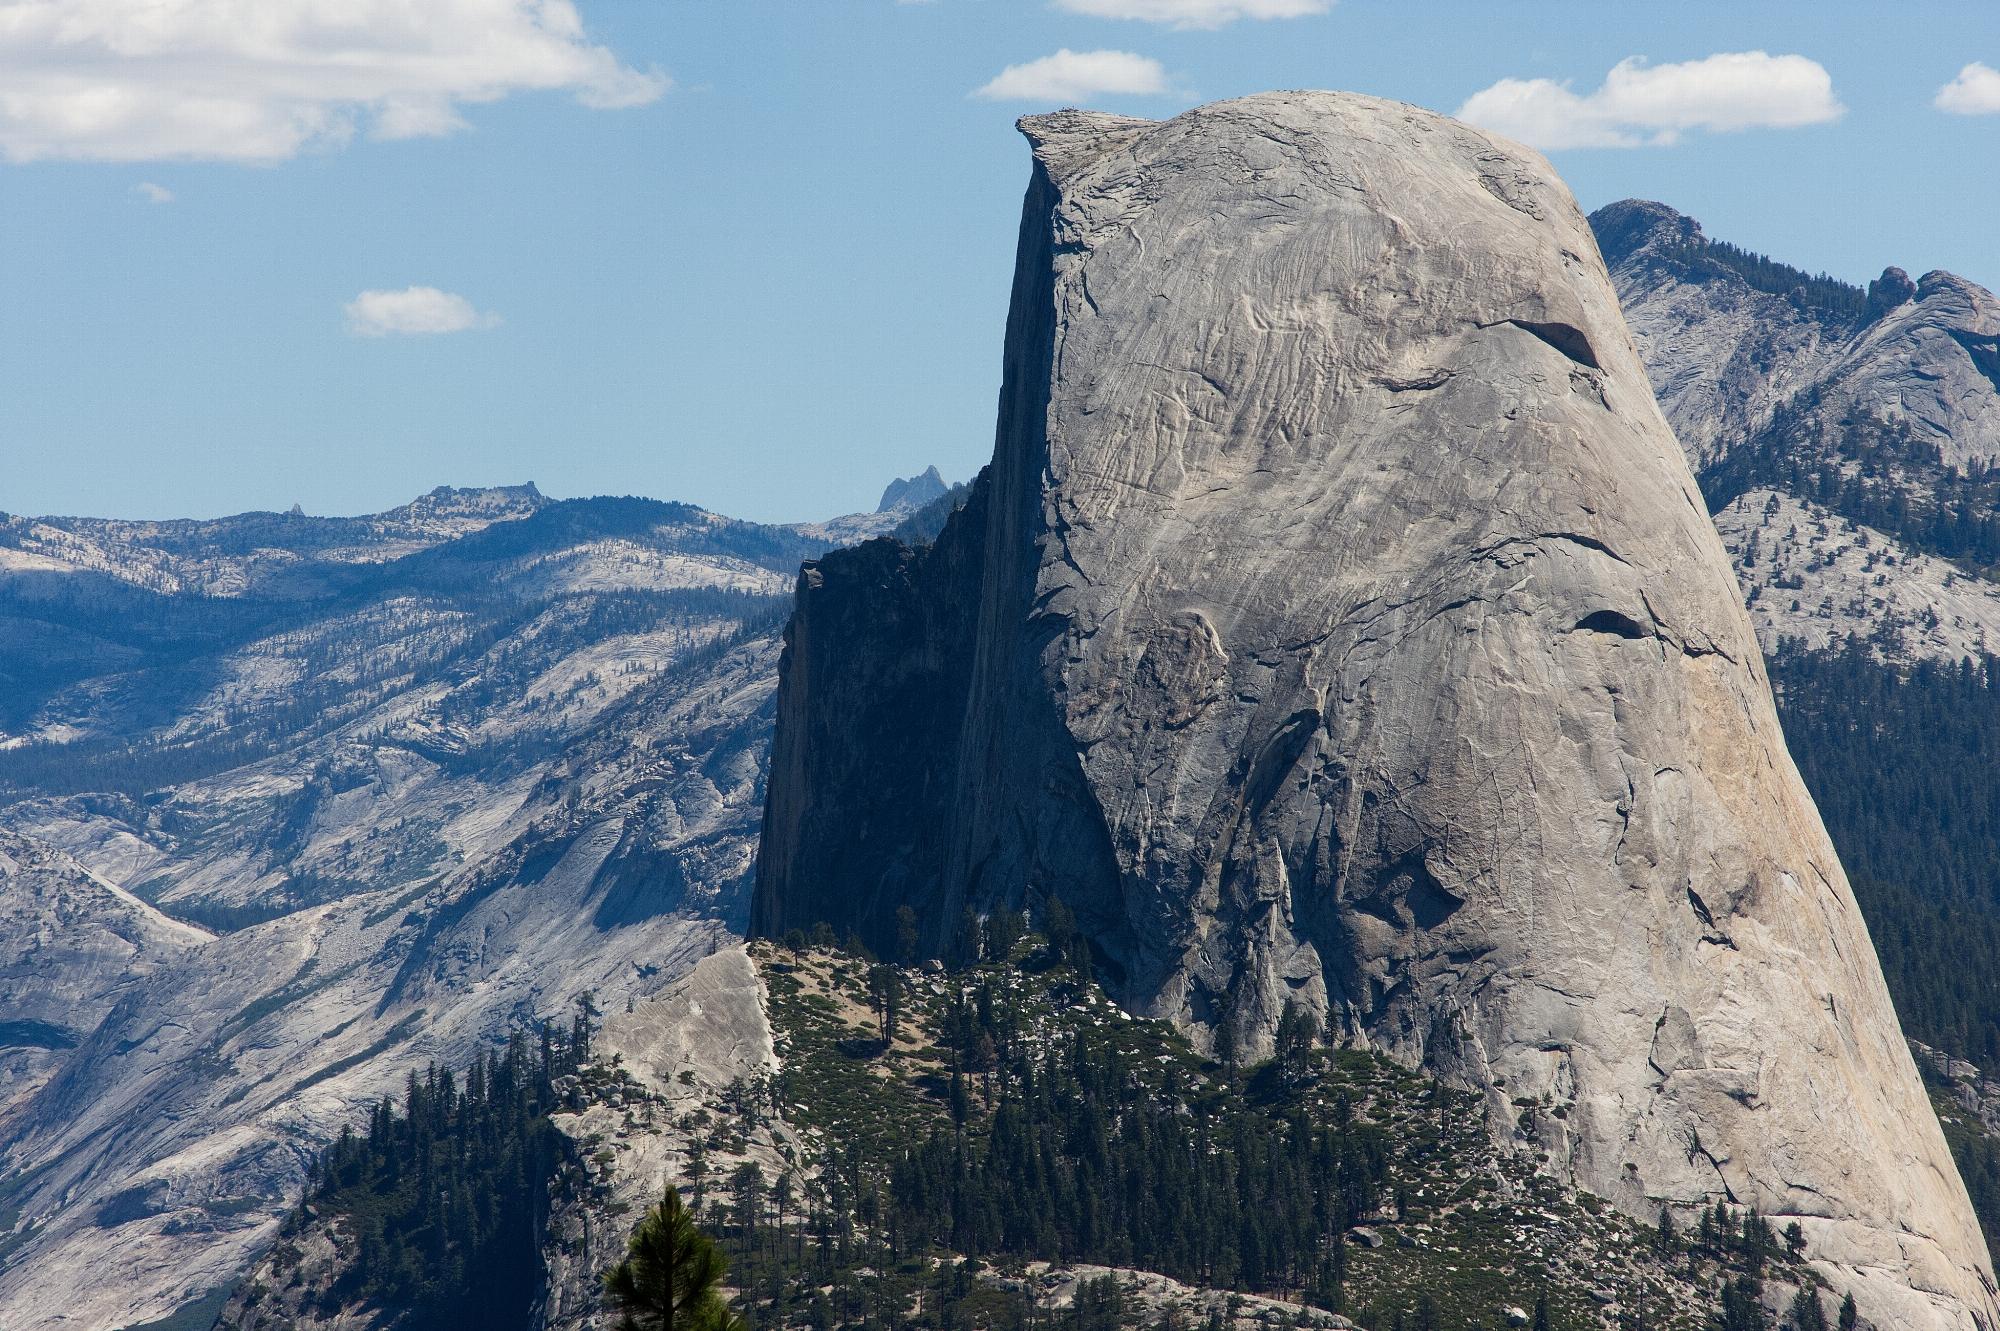 Yosemite_Half-Dome1_105mm.jpg